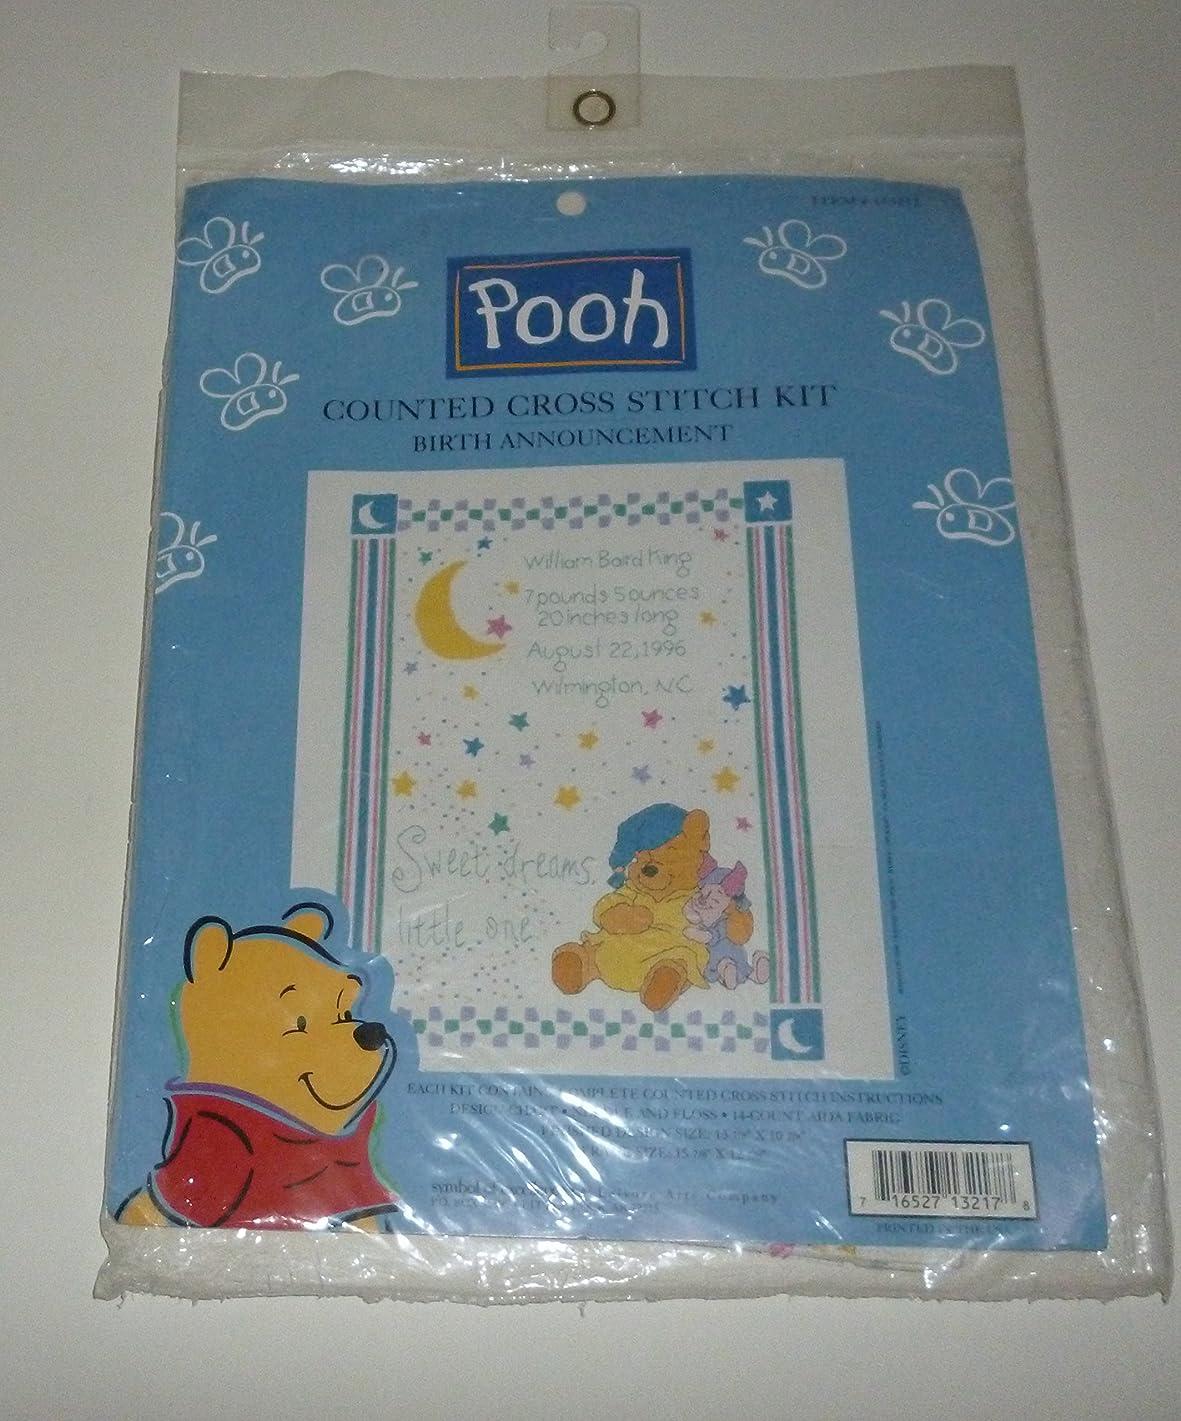 Pooh Birth Announcement Cross Stitch